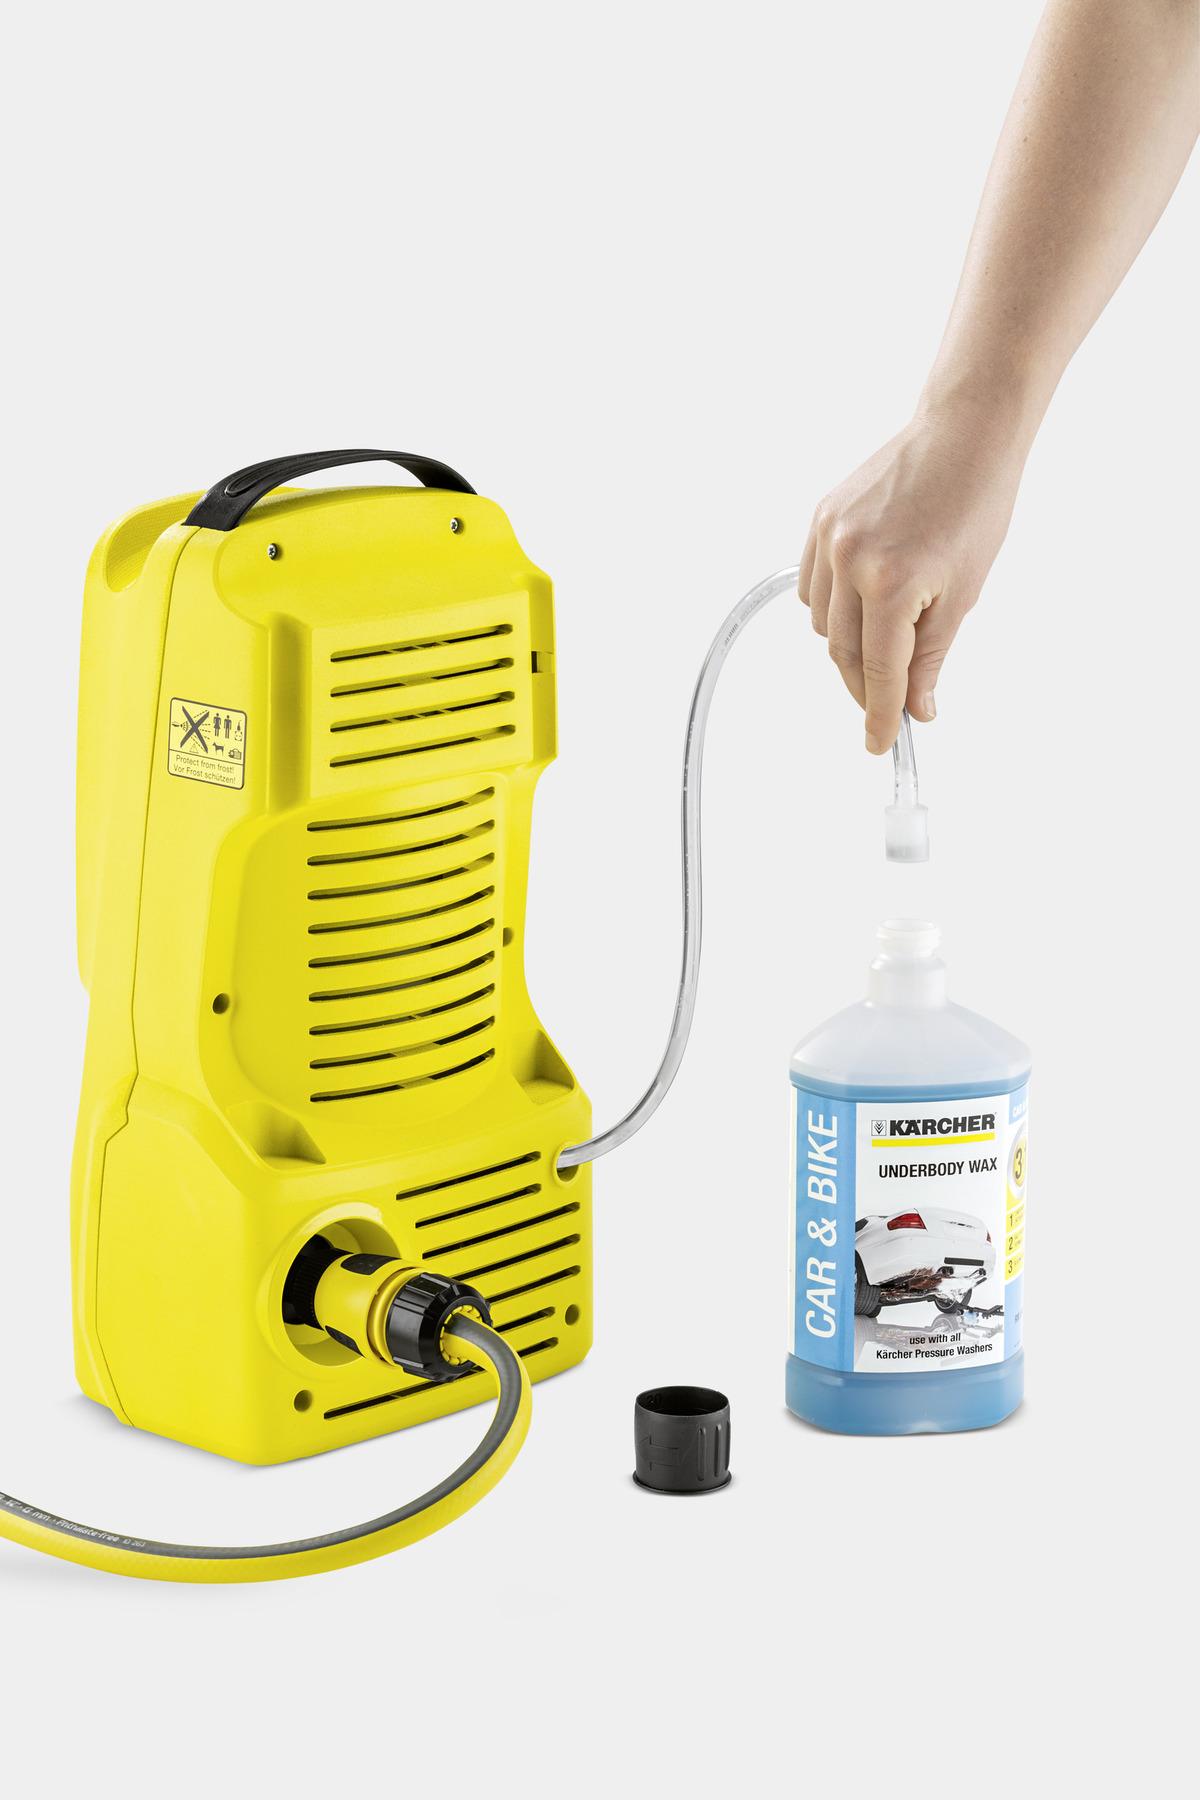 karcher-mašina-za-pranje-karcher-perač-k-2-compact